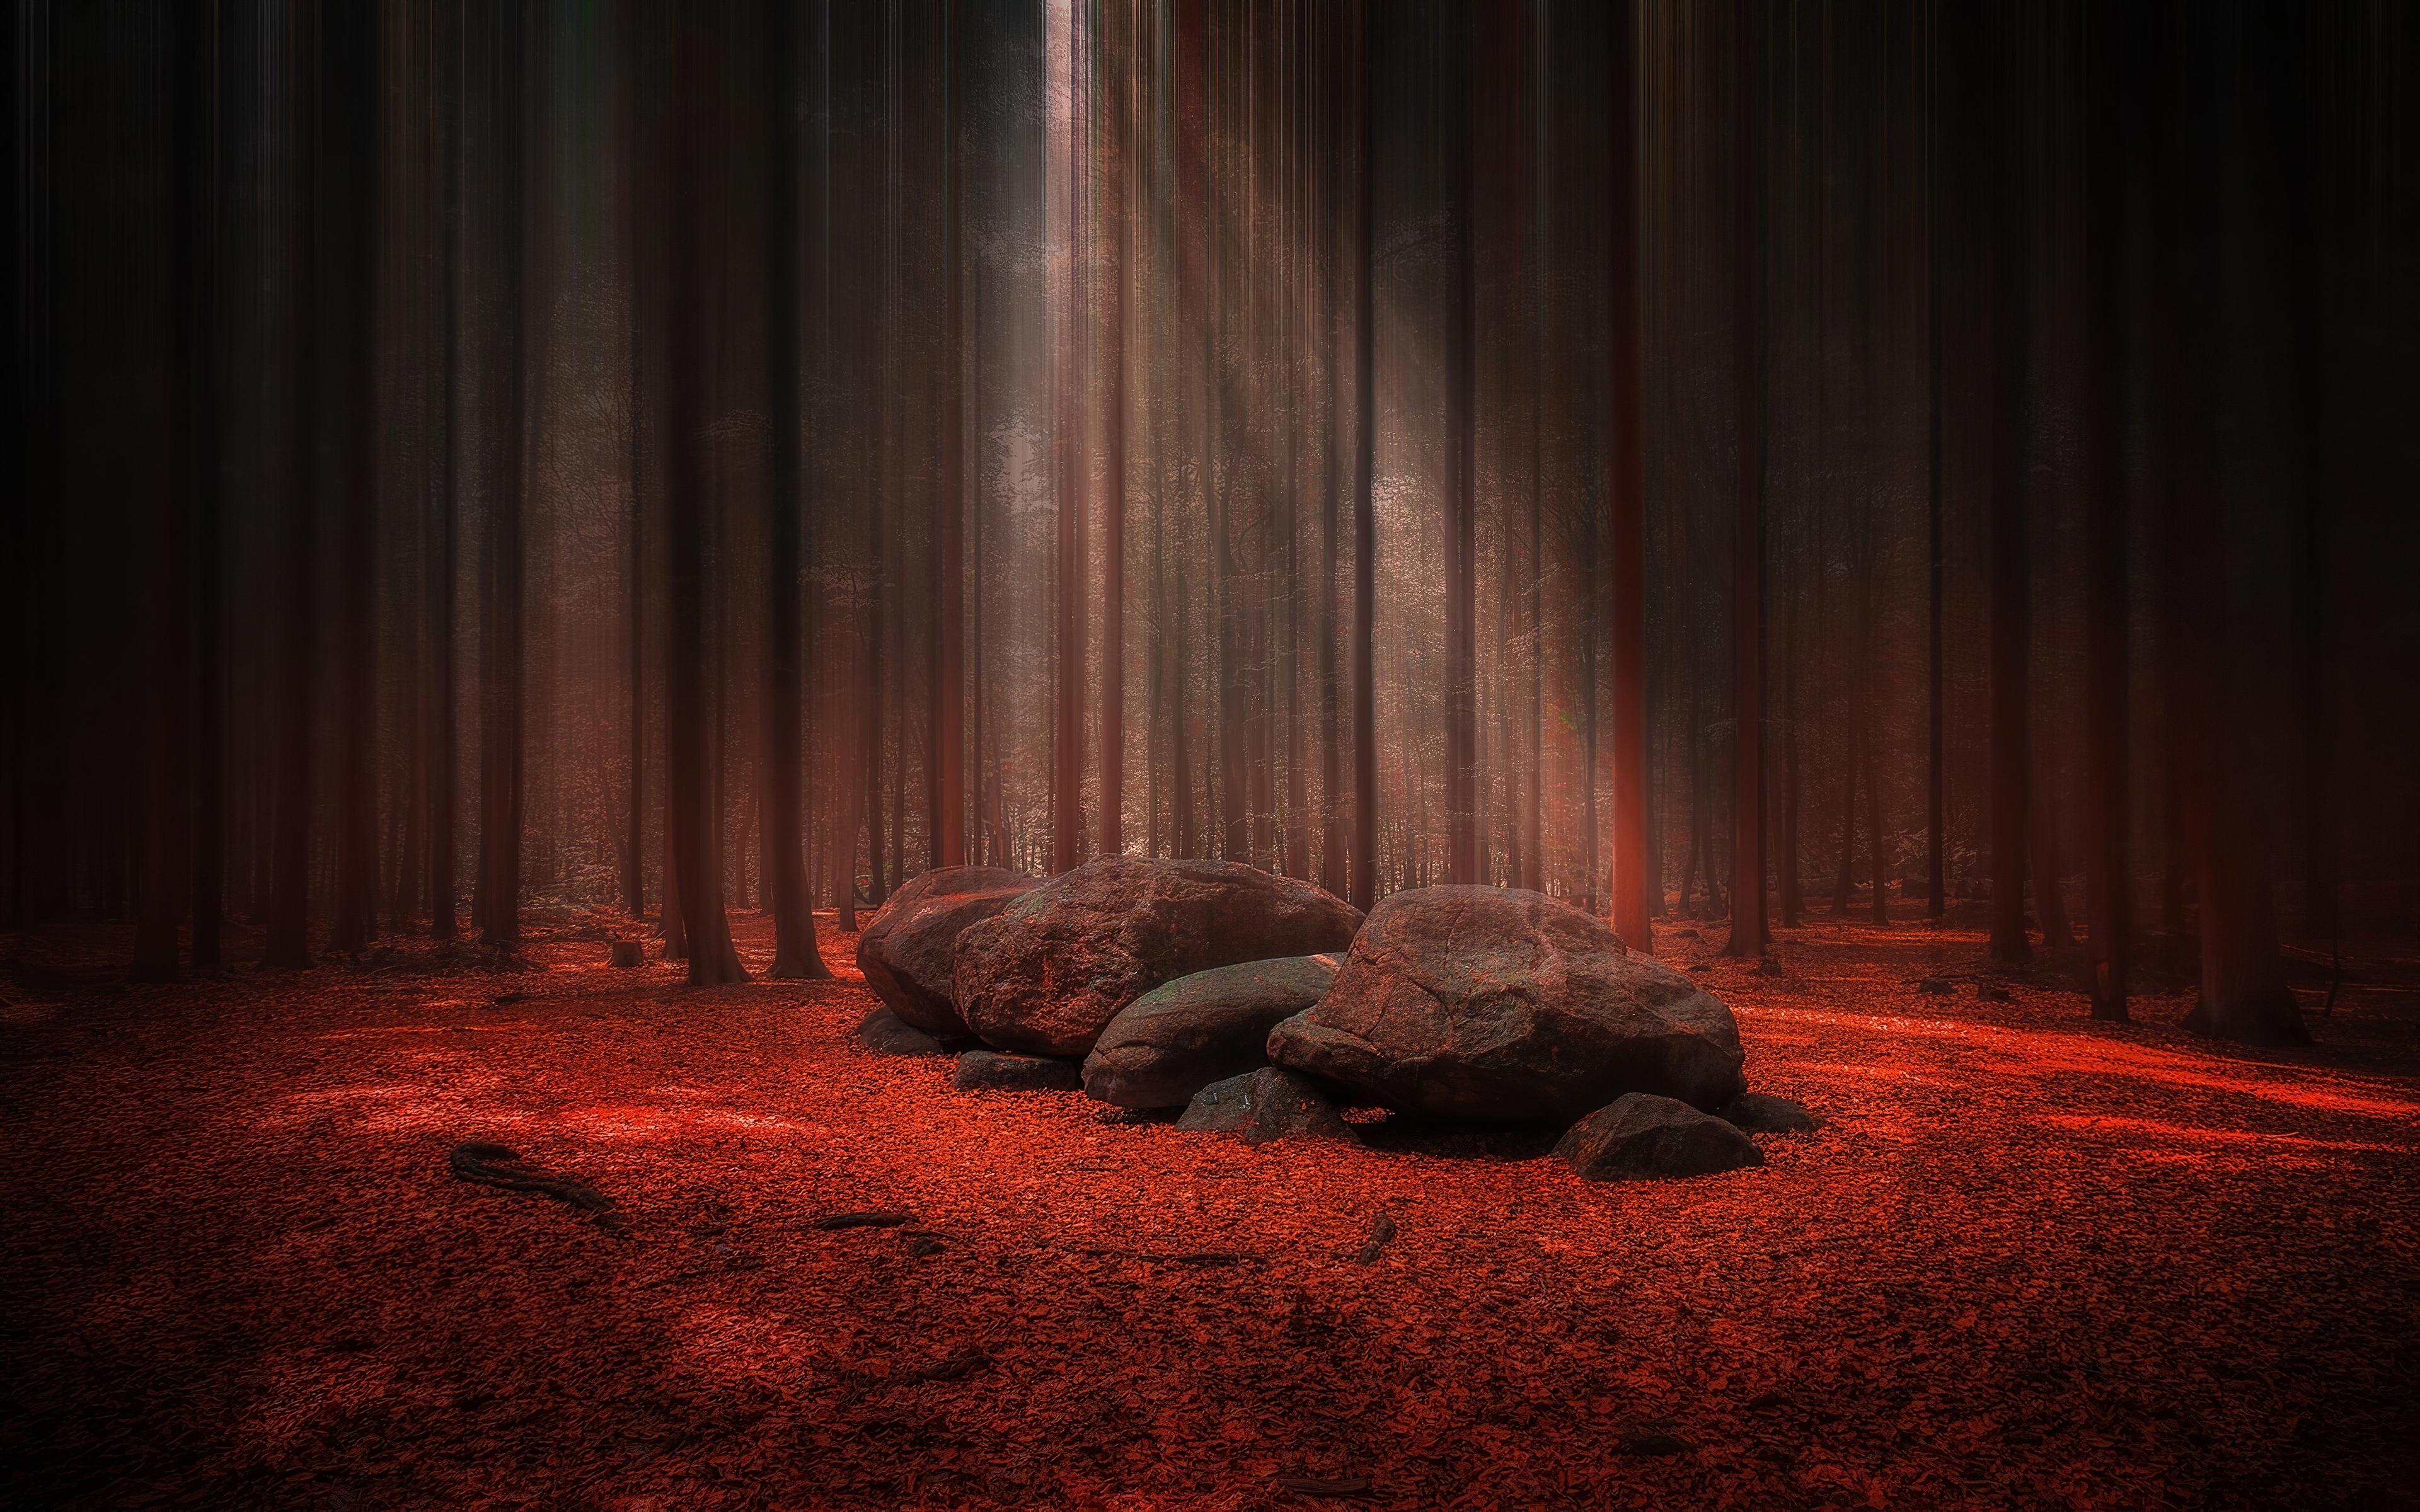 red stones wood light beams 1574937651 - Red Stones Wood Light Beams -